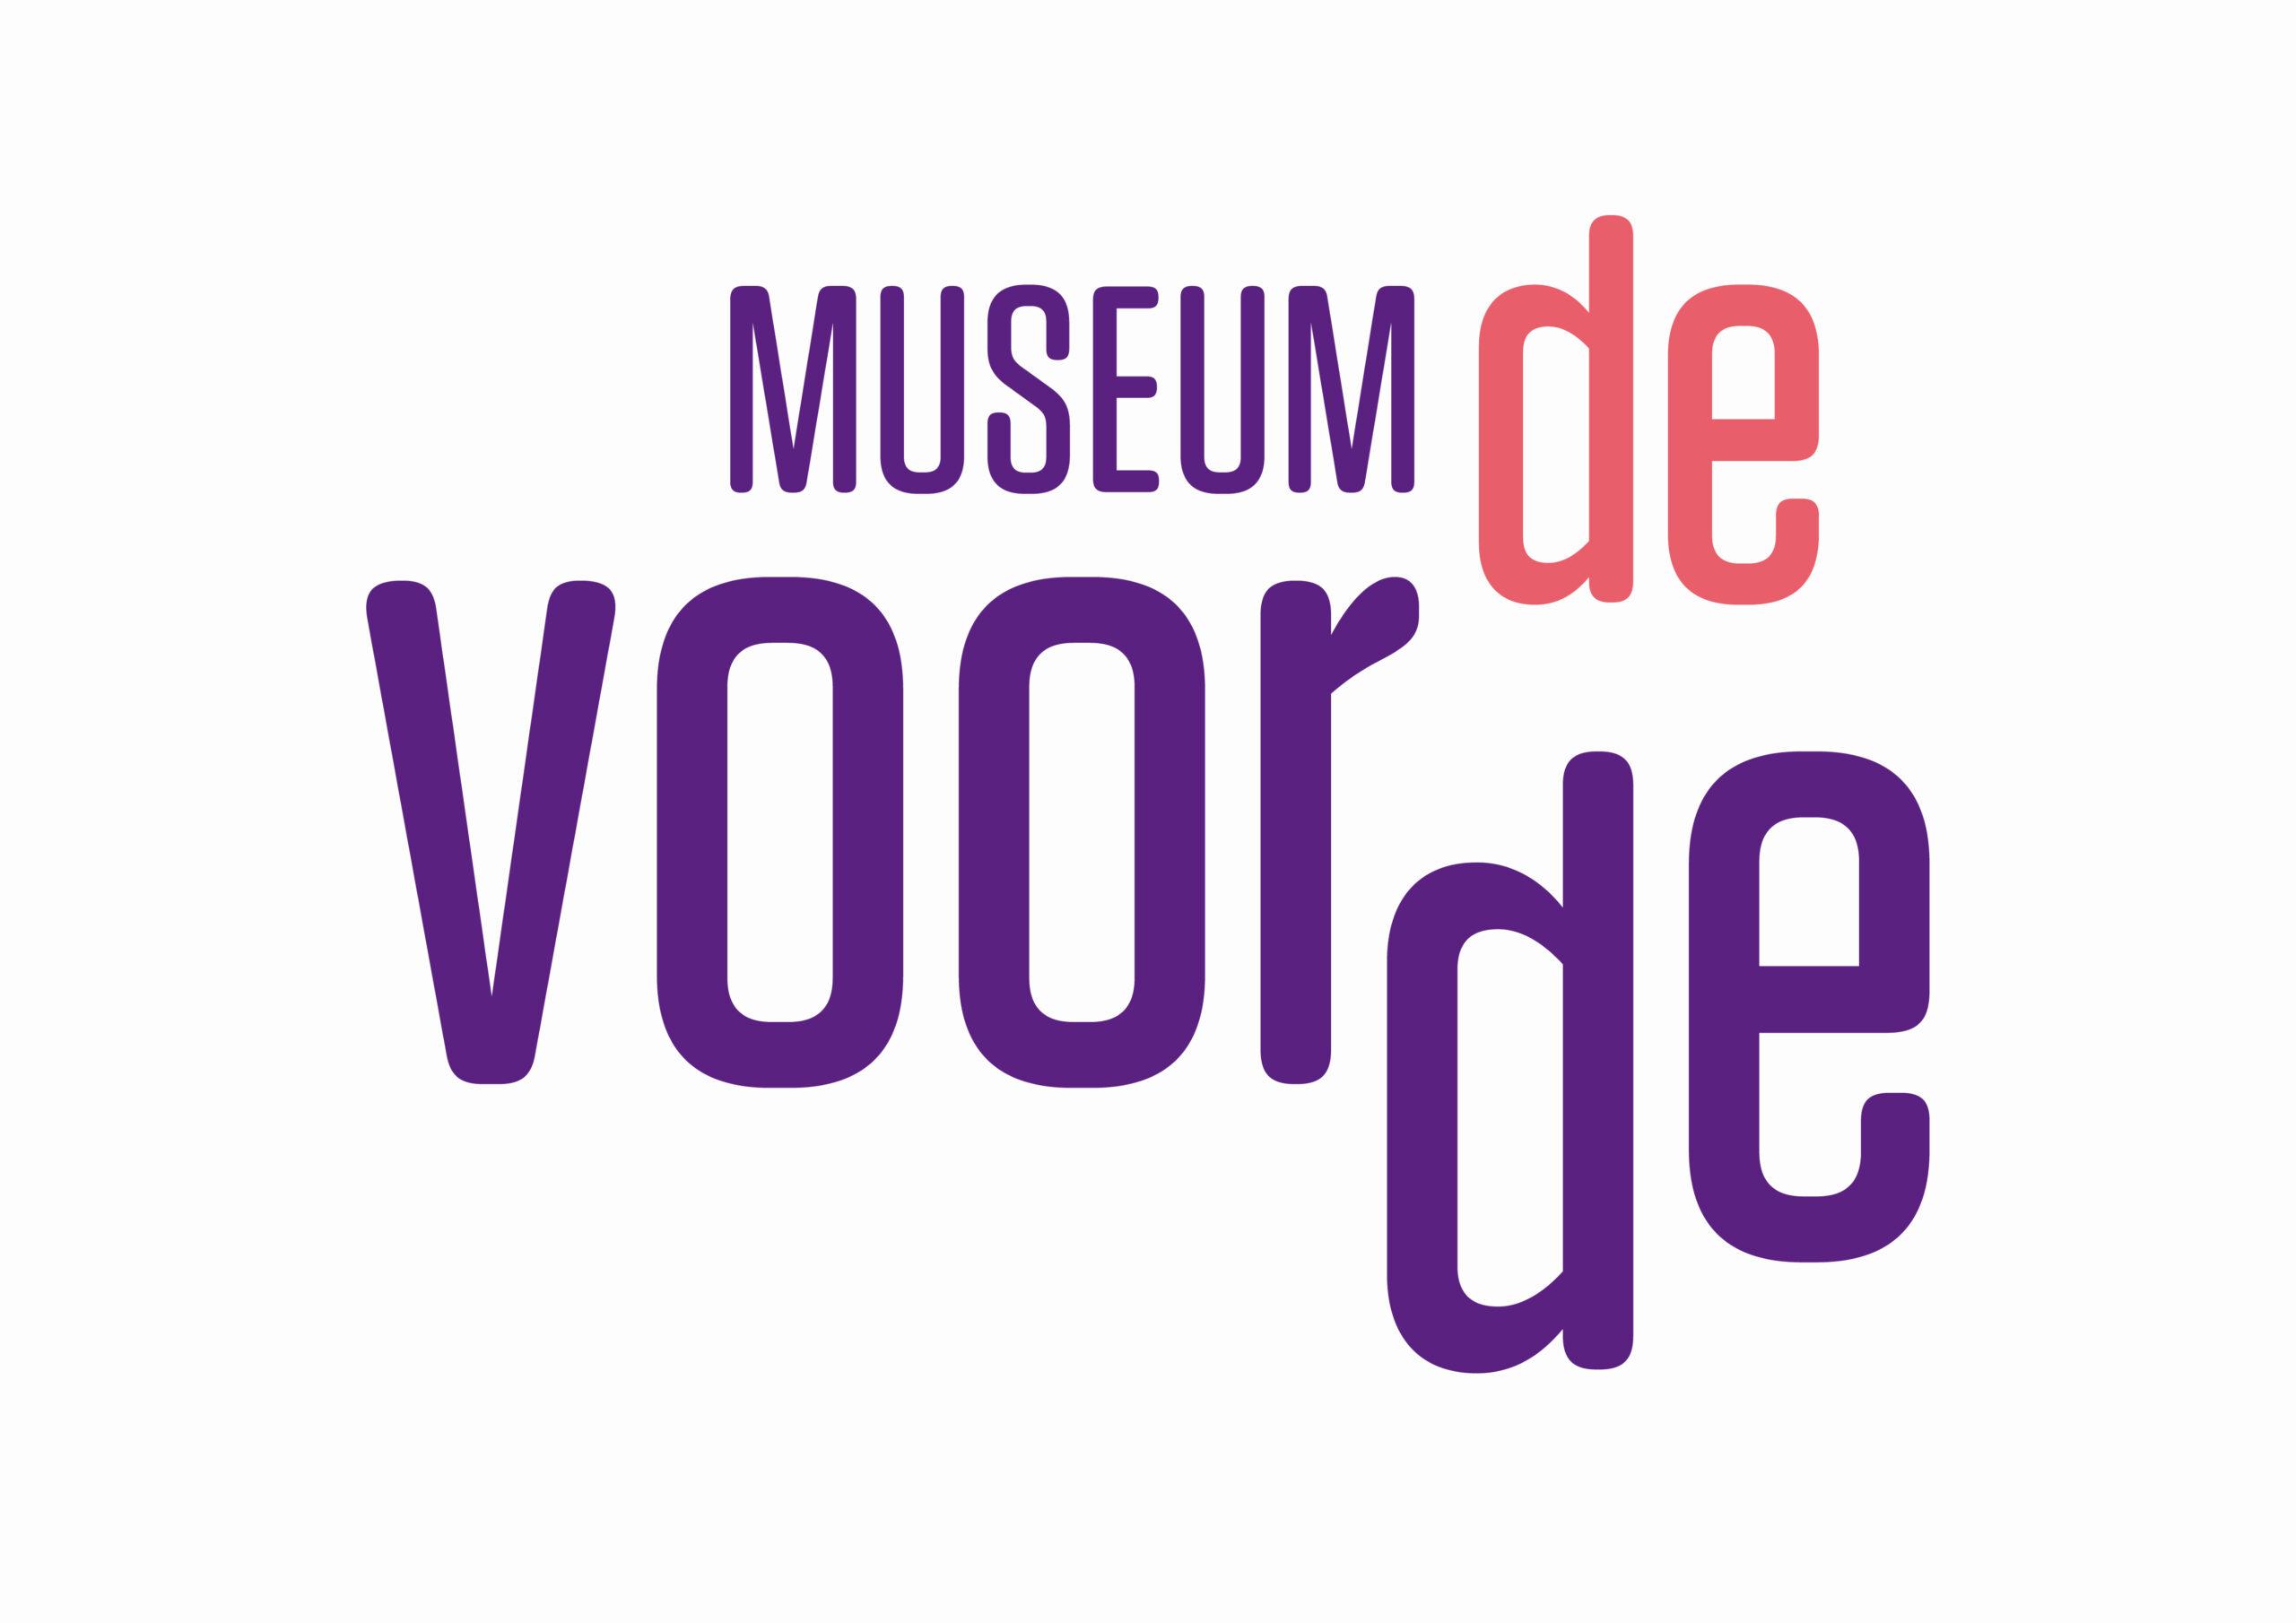 Museum_De_Voorde_logo1-0d3a9e9f